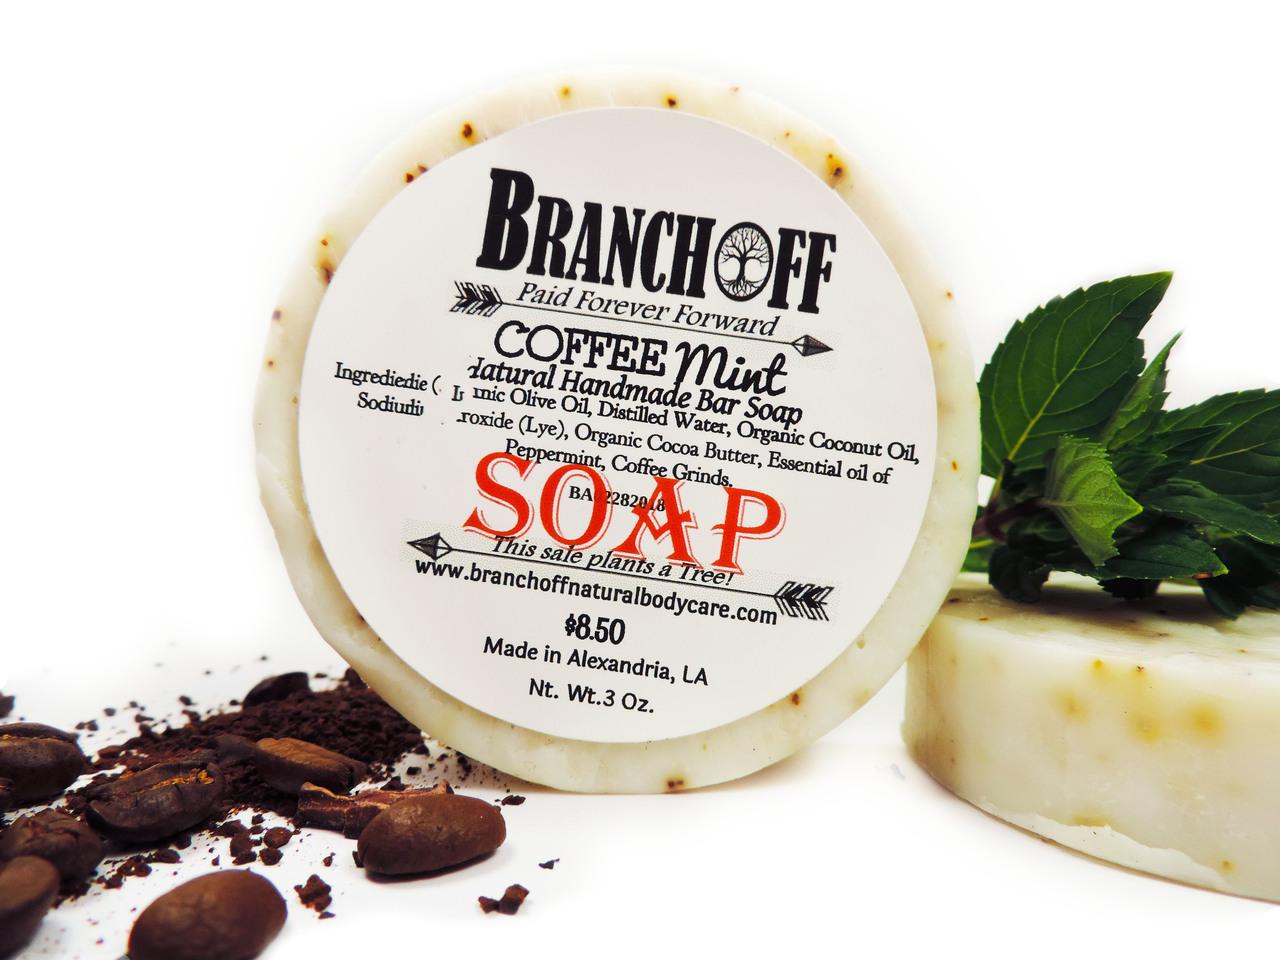 Coca Butter & Coffee Mint Soap